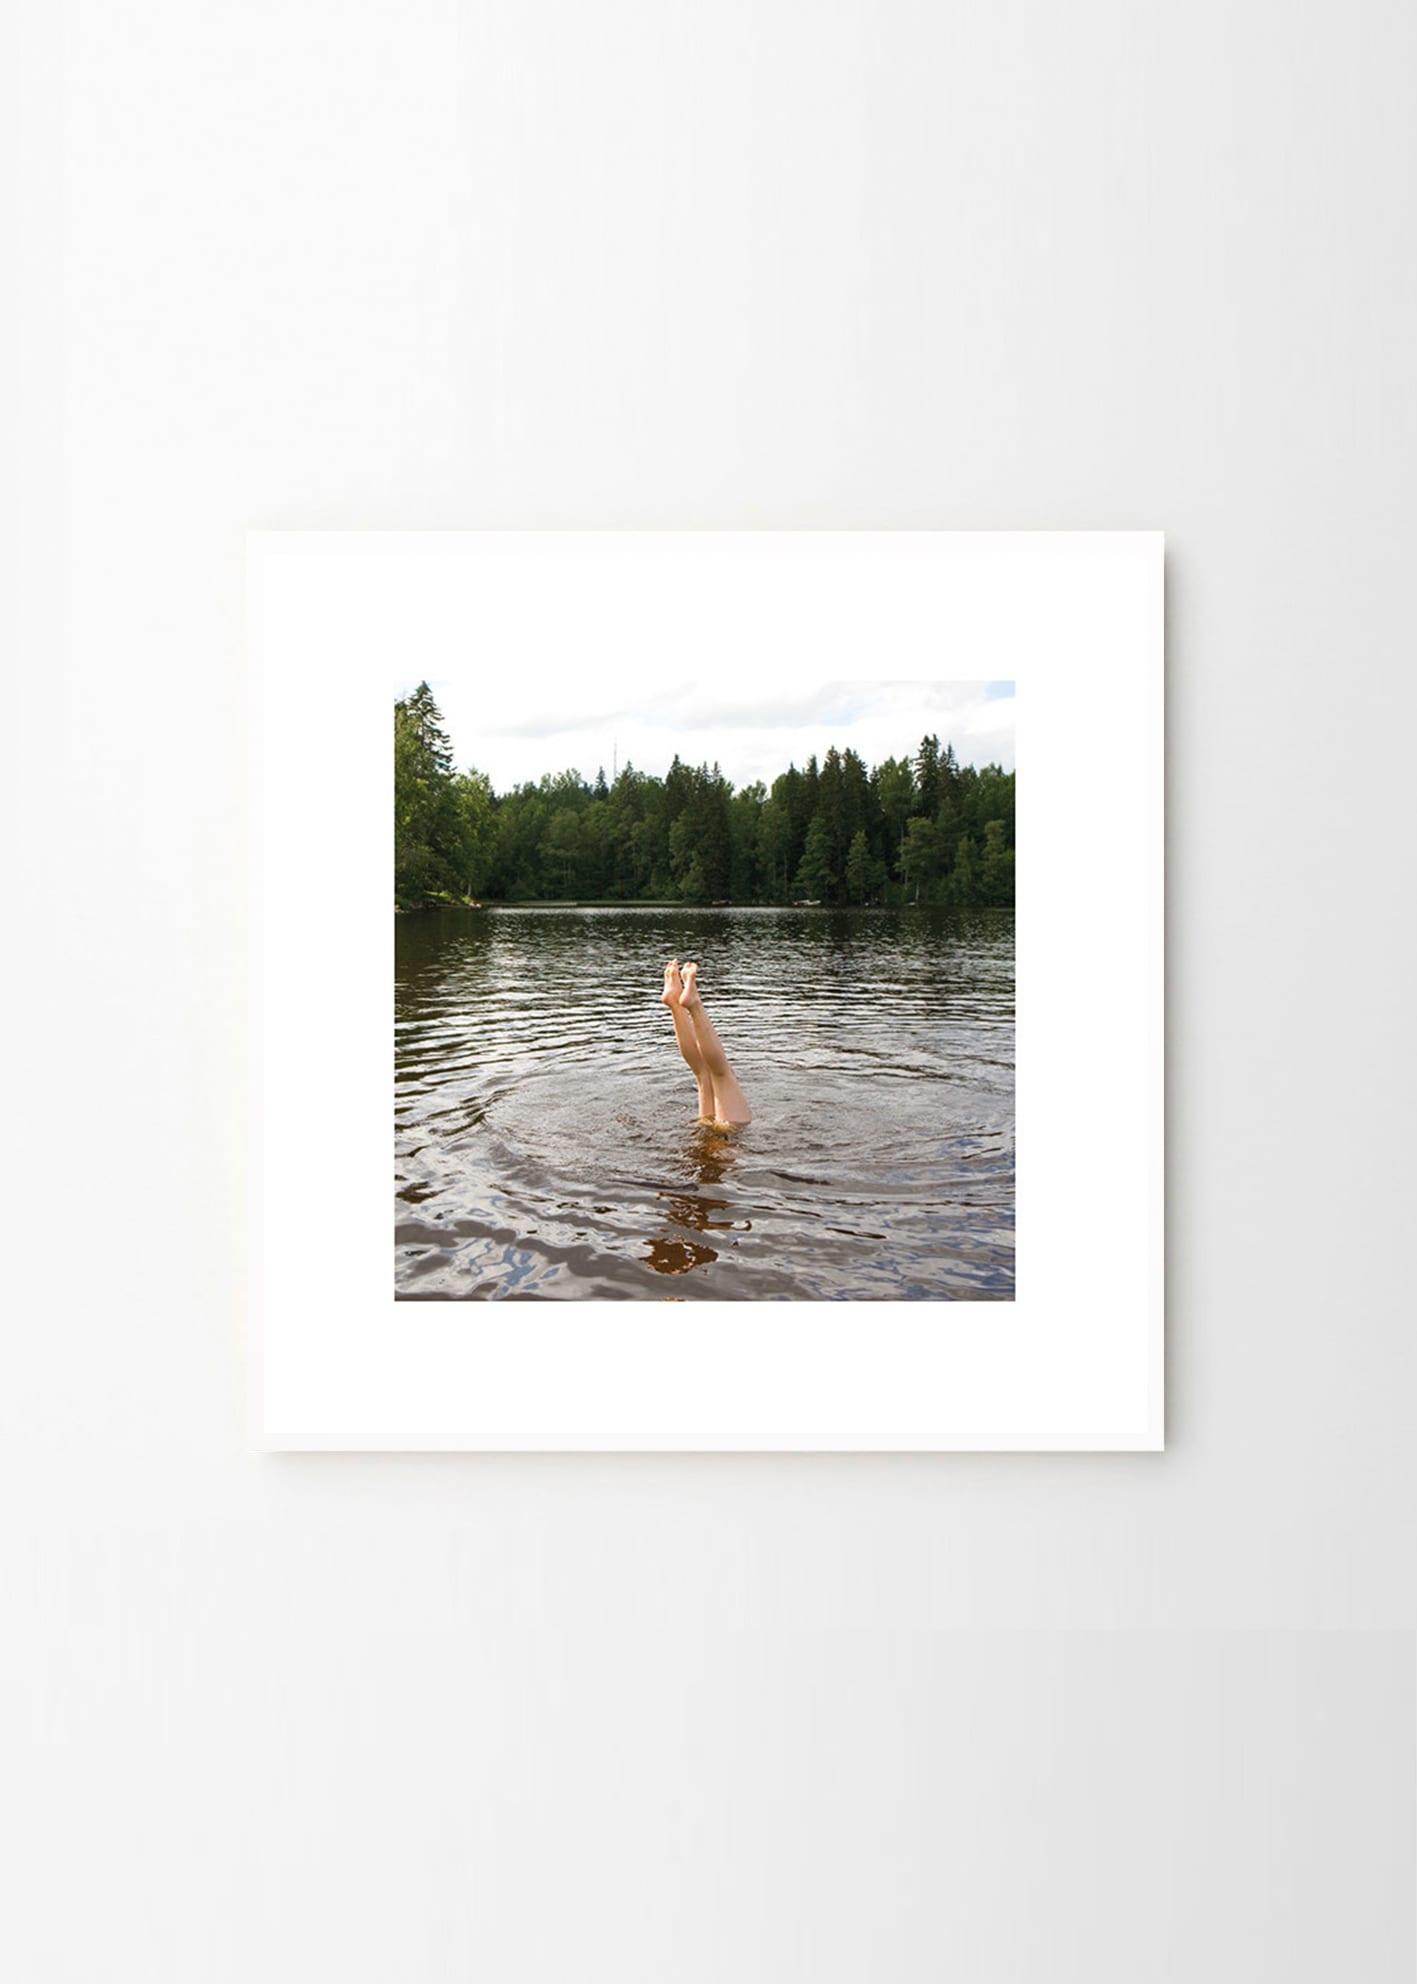 fine little day swim poster the poster club. Black Bedroom Furniture Sets. Home Design Ideas